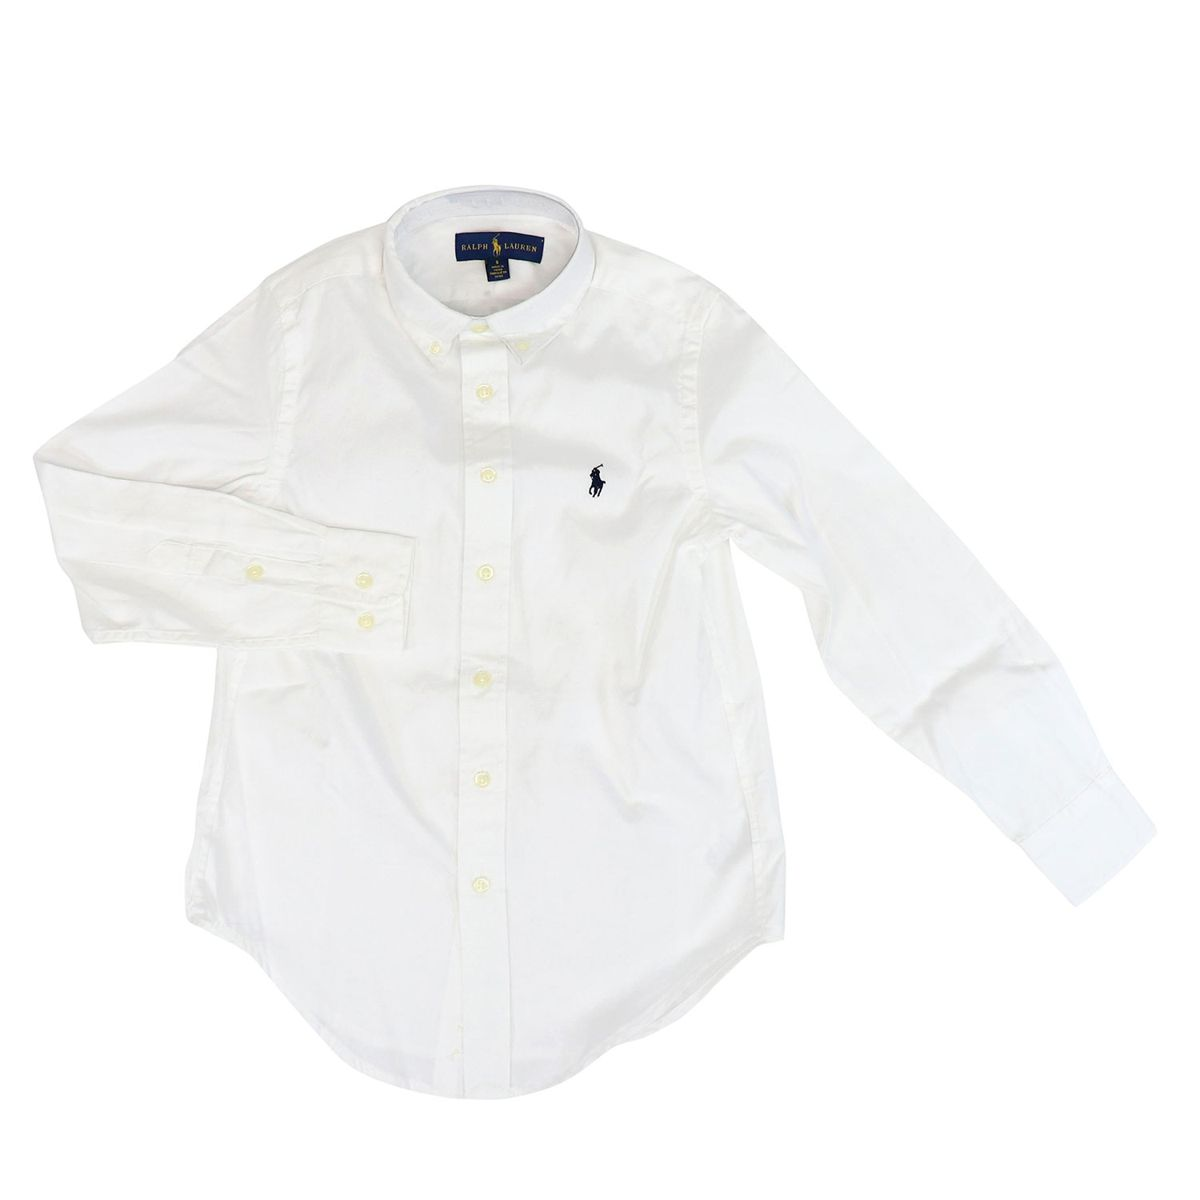 Cotton button-down shirt White Polo Ralph Lauren